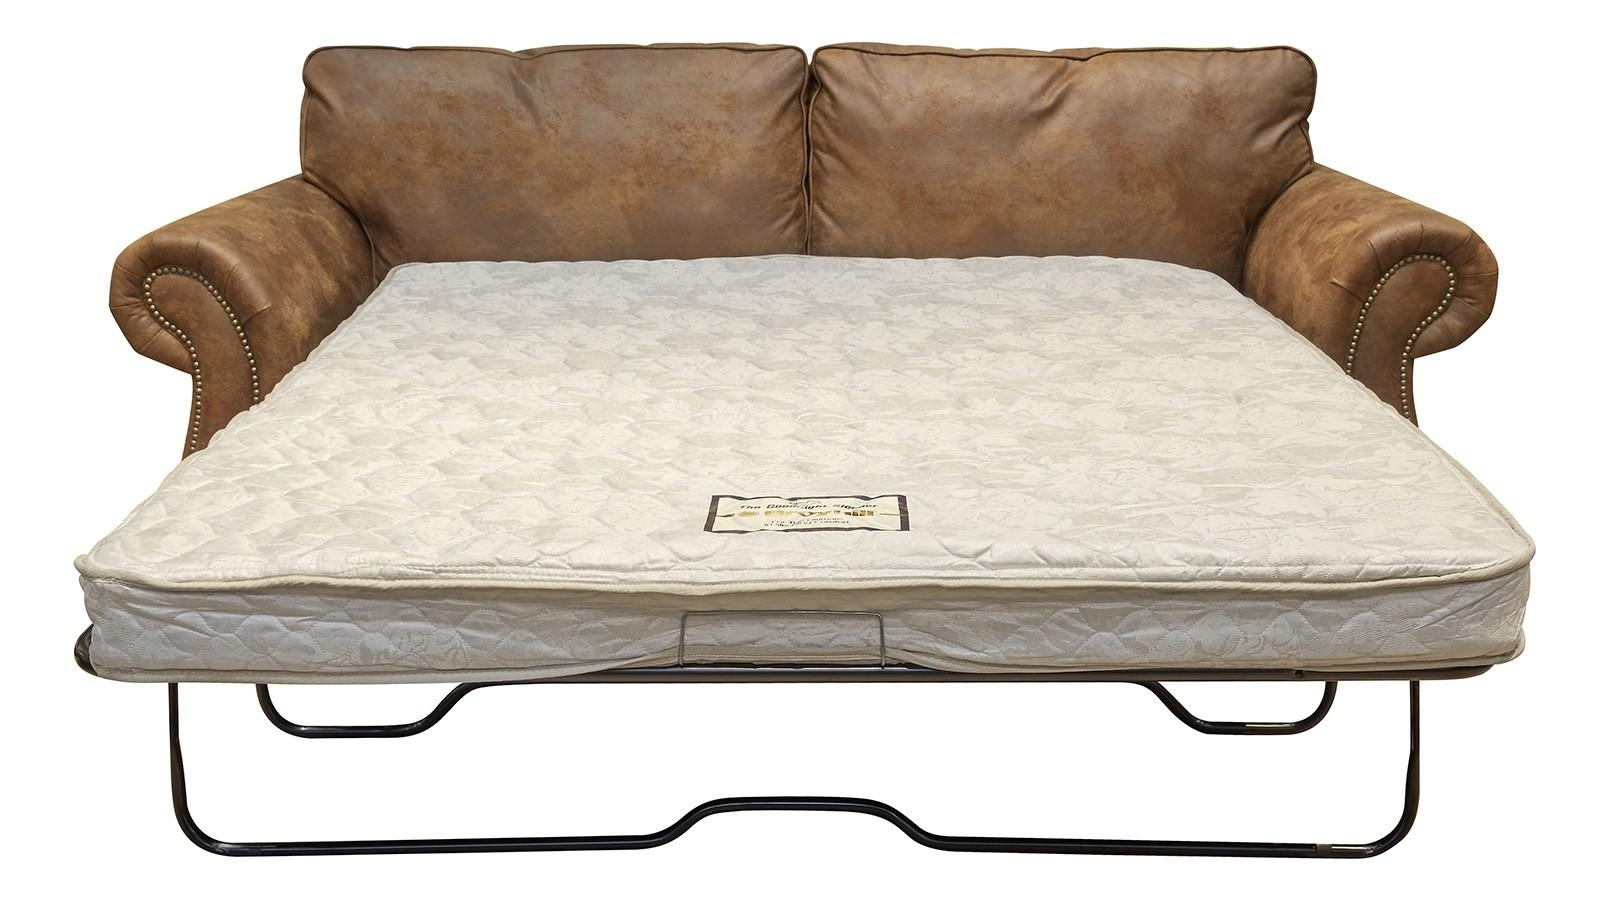 Texas Brown Queen Sleeper Sofa | Gallery Furniture With Regard To Sofa Beds Queen (Image 20 of 21)